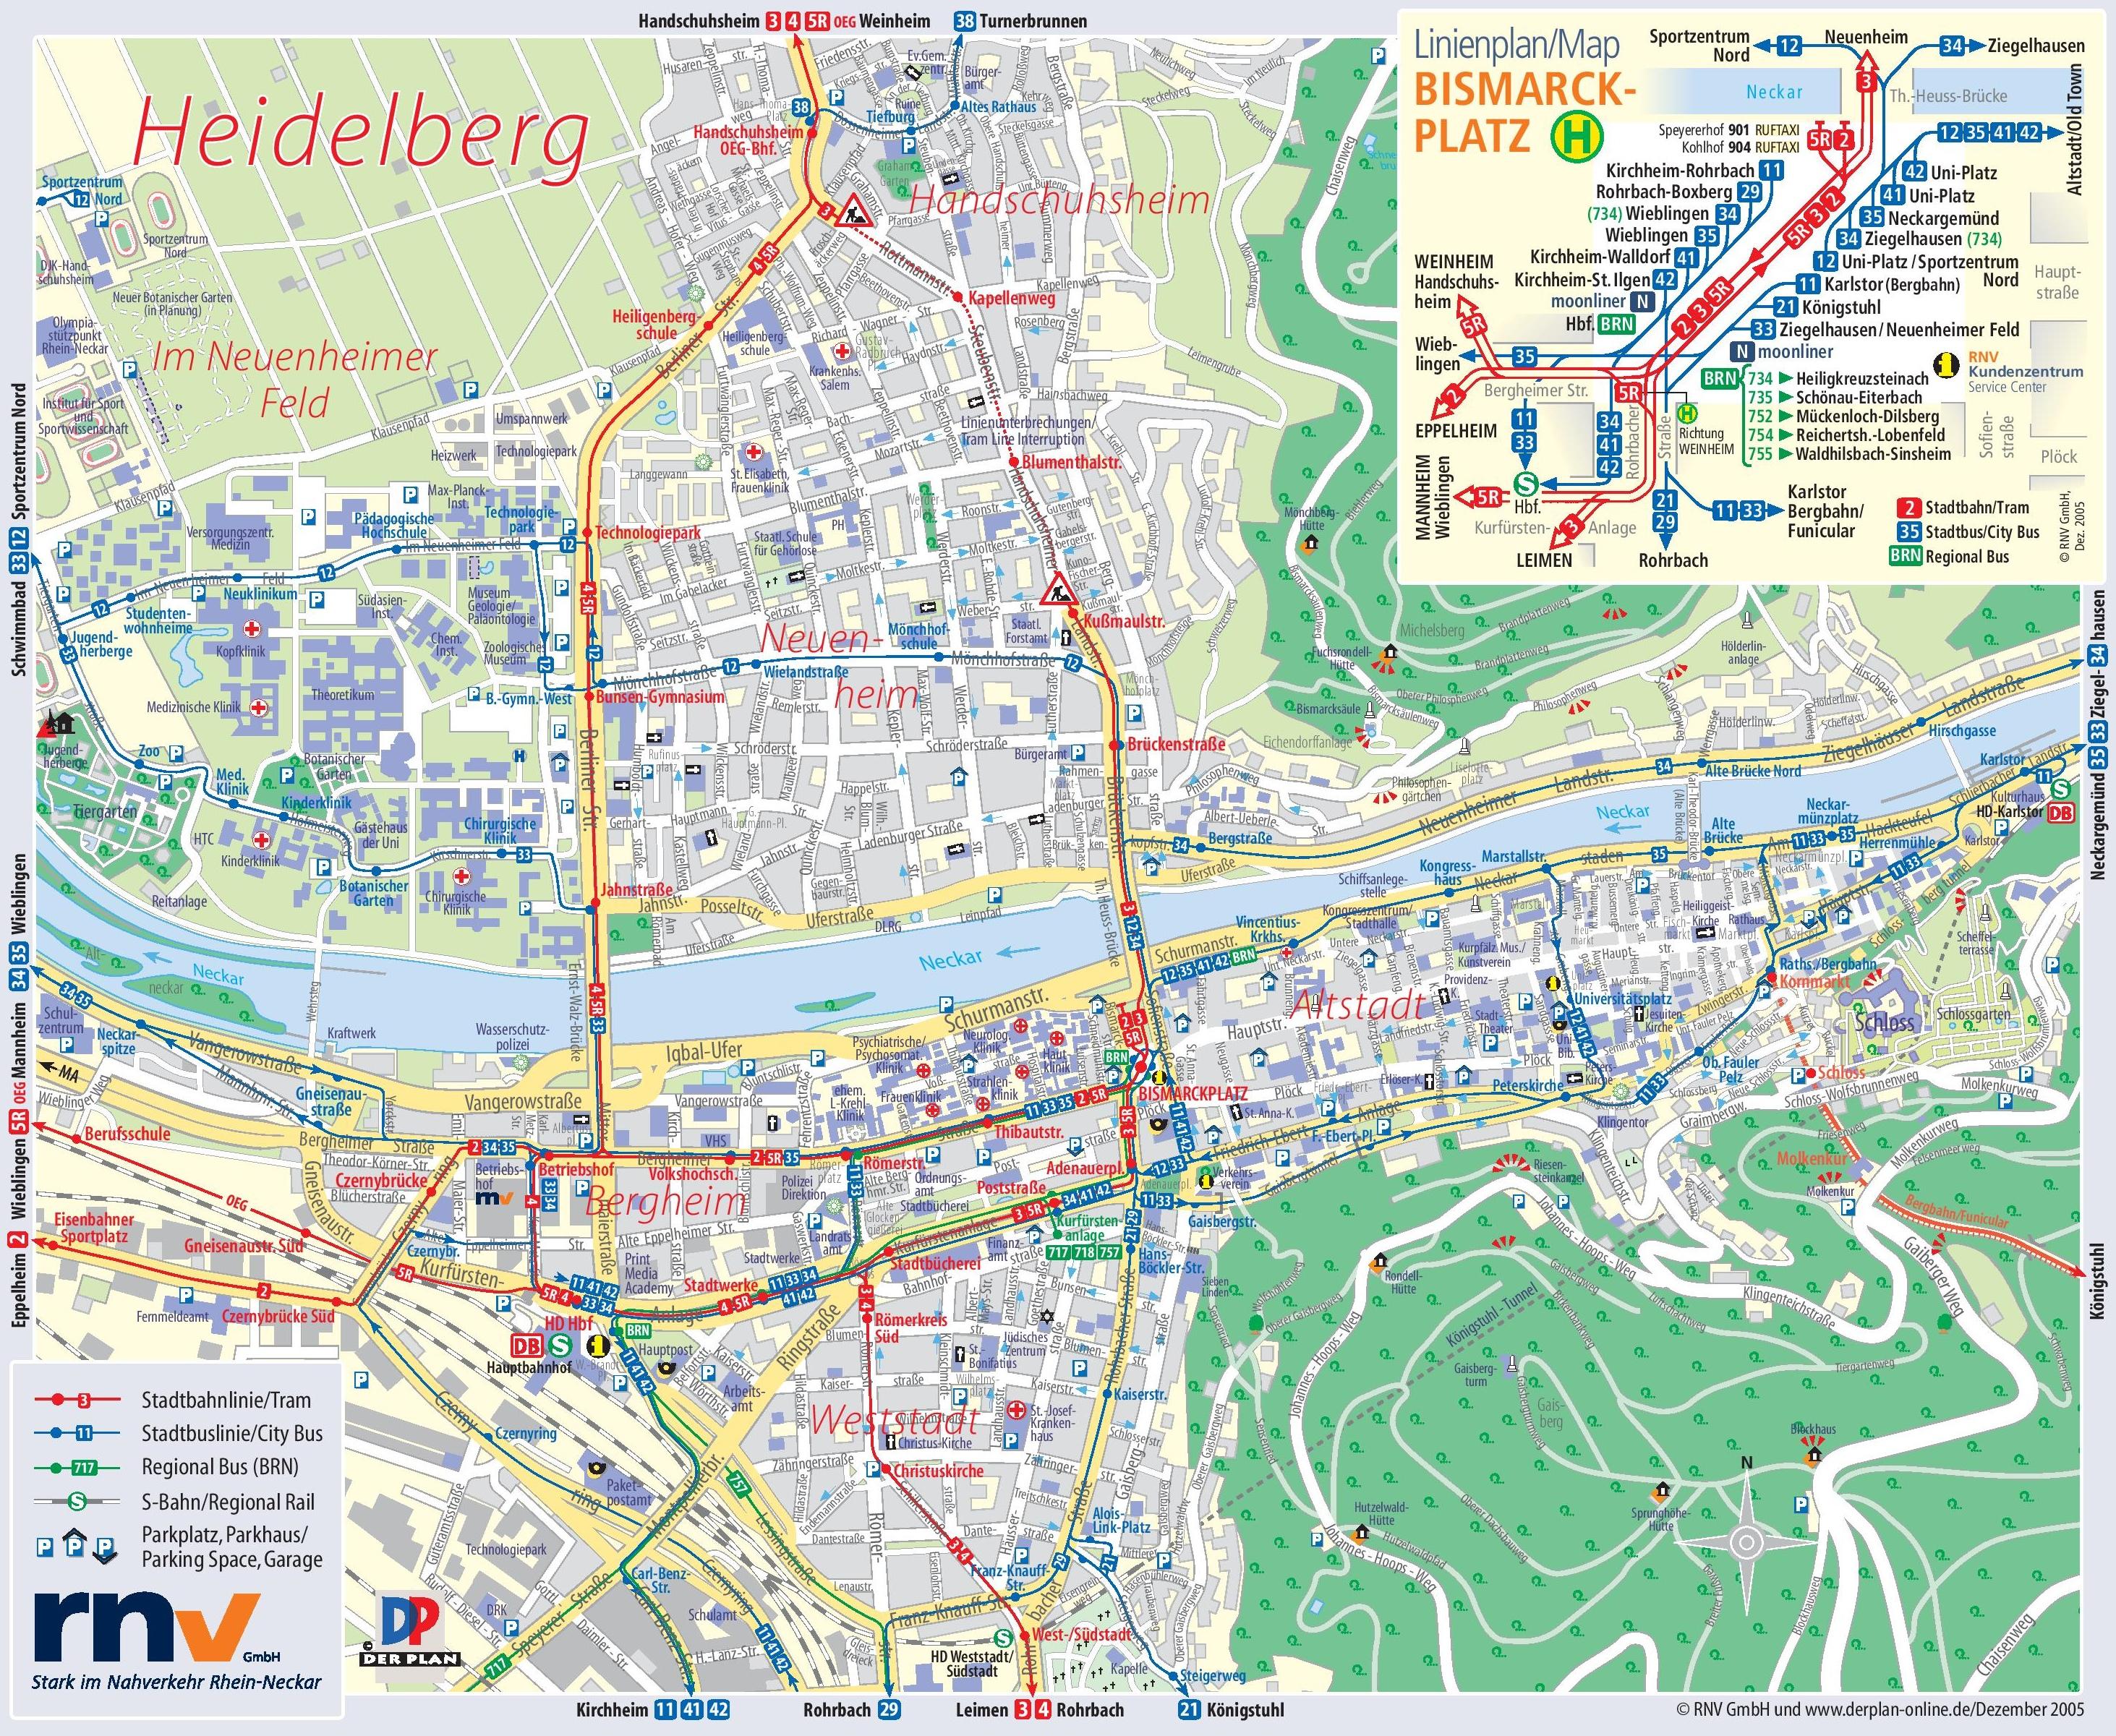 Heidelberg Germany Map Heidelberg tourist map Heidelberg Germany Map